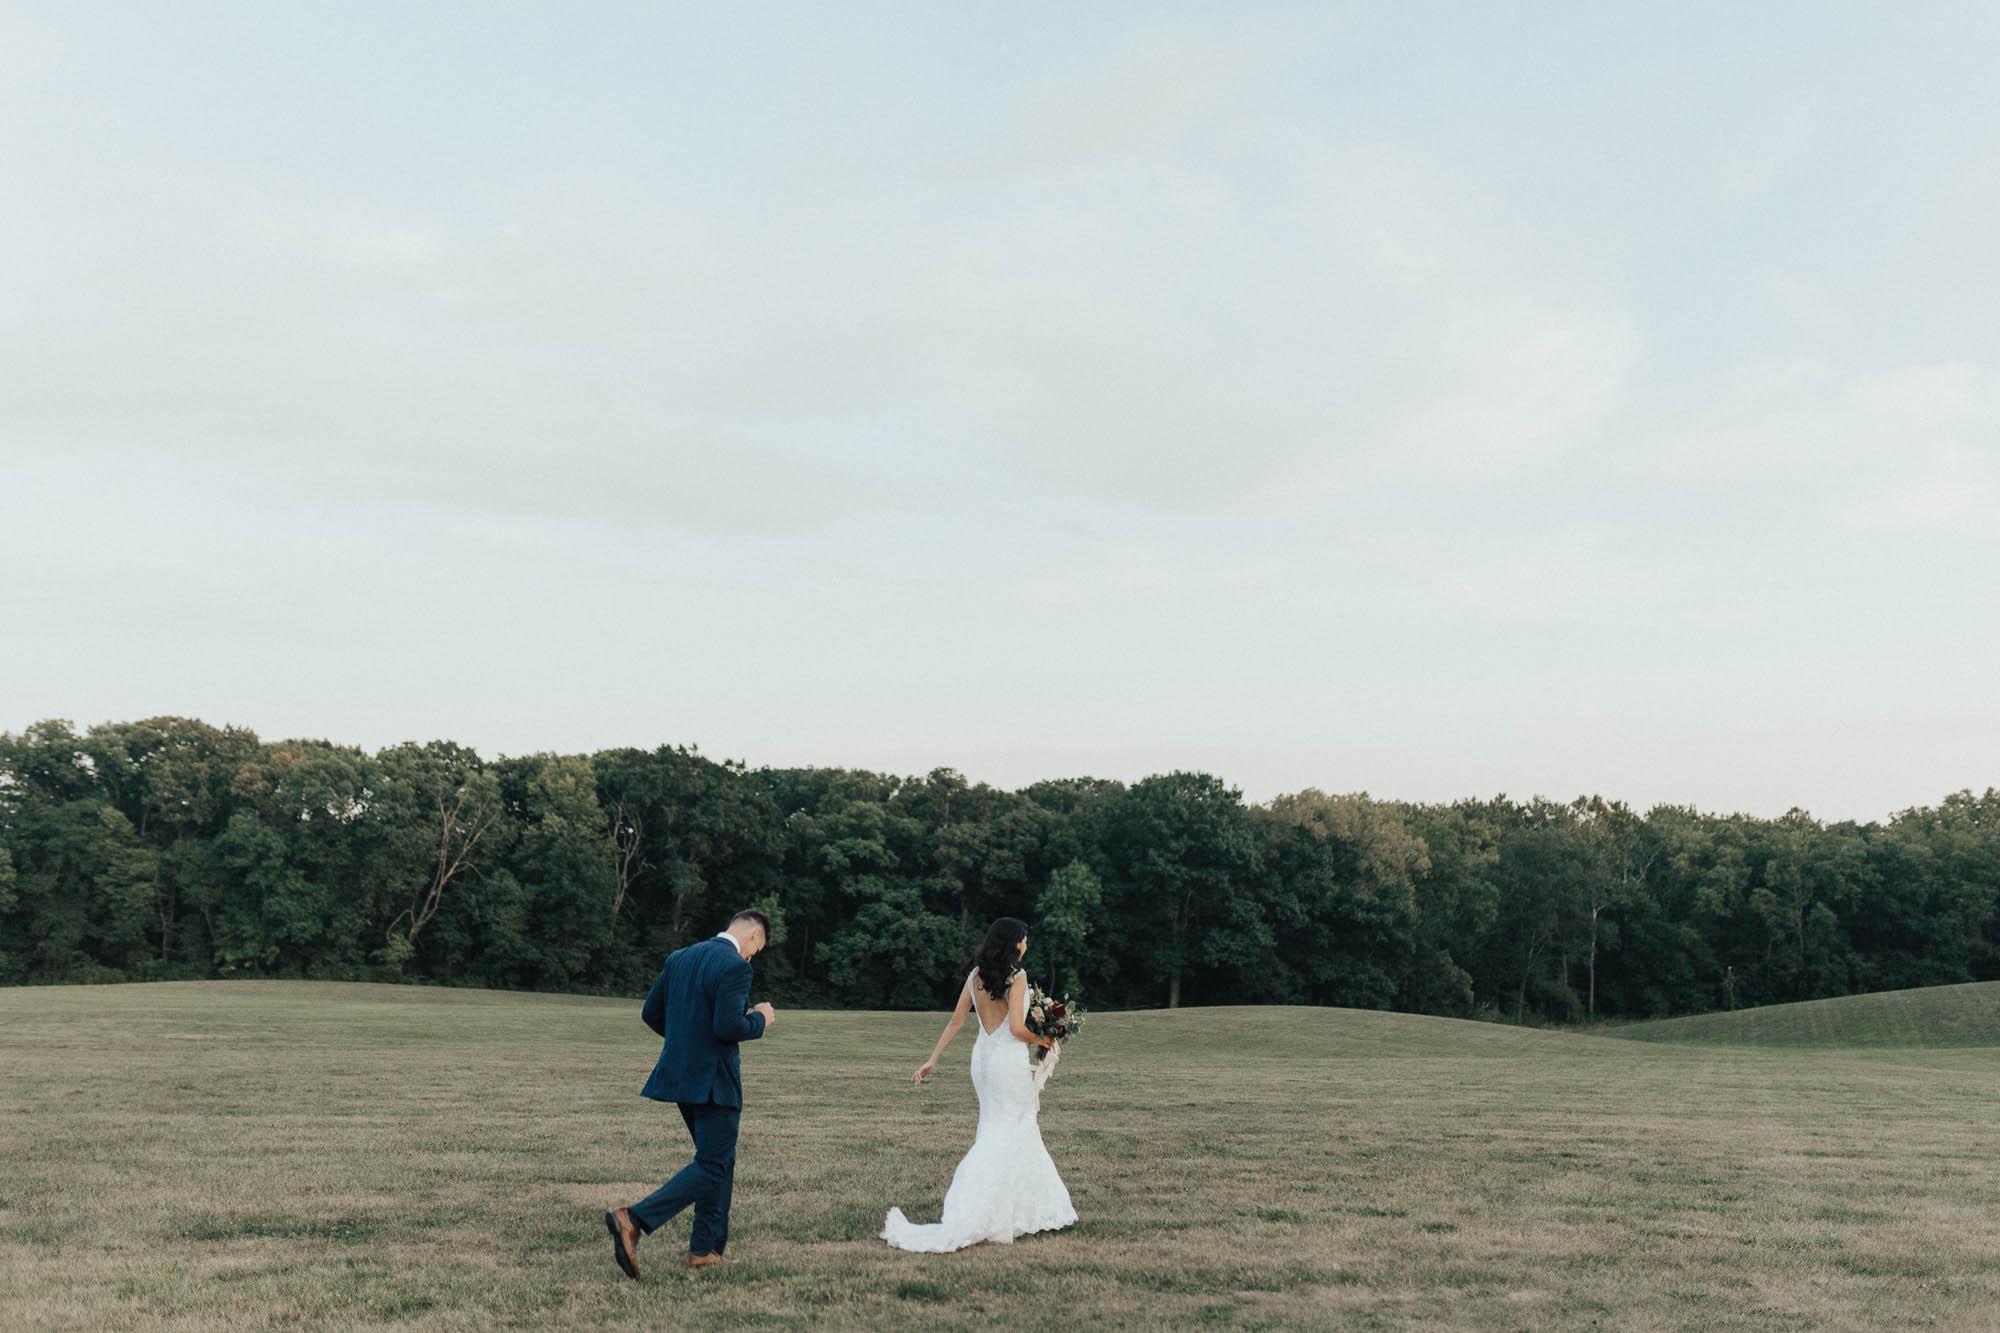 champaign_il_wedding_photography-0875.jpg